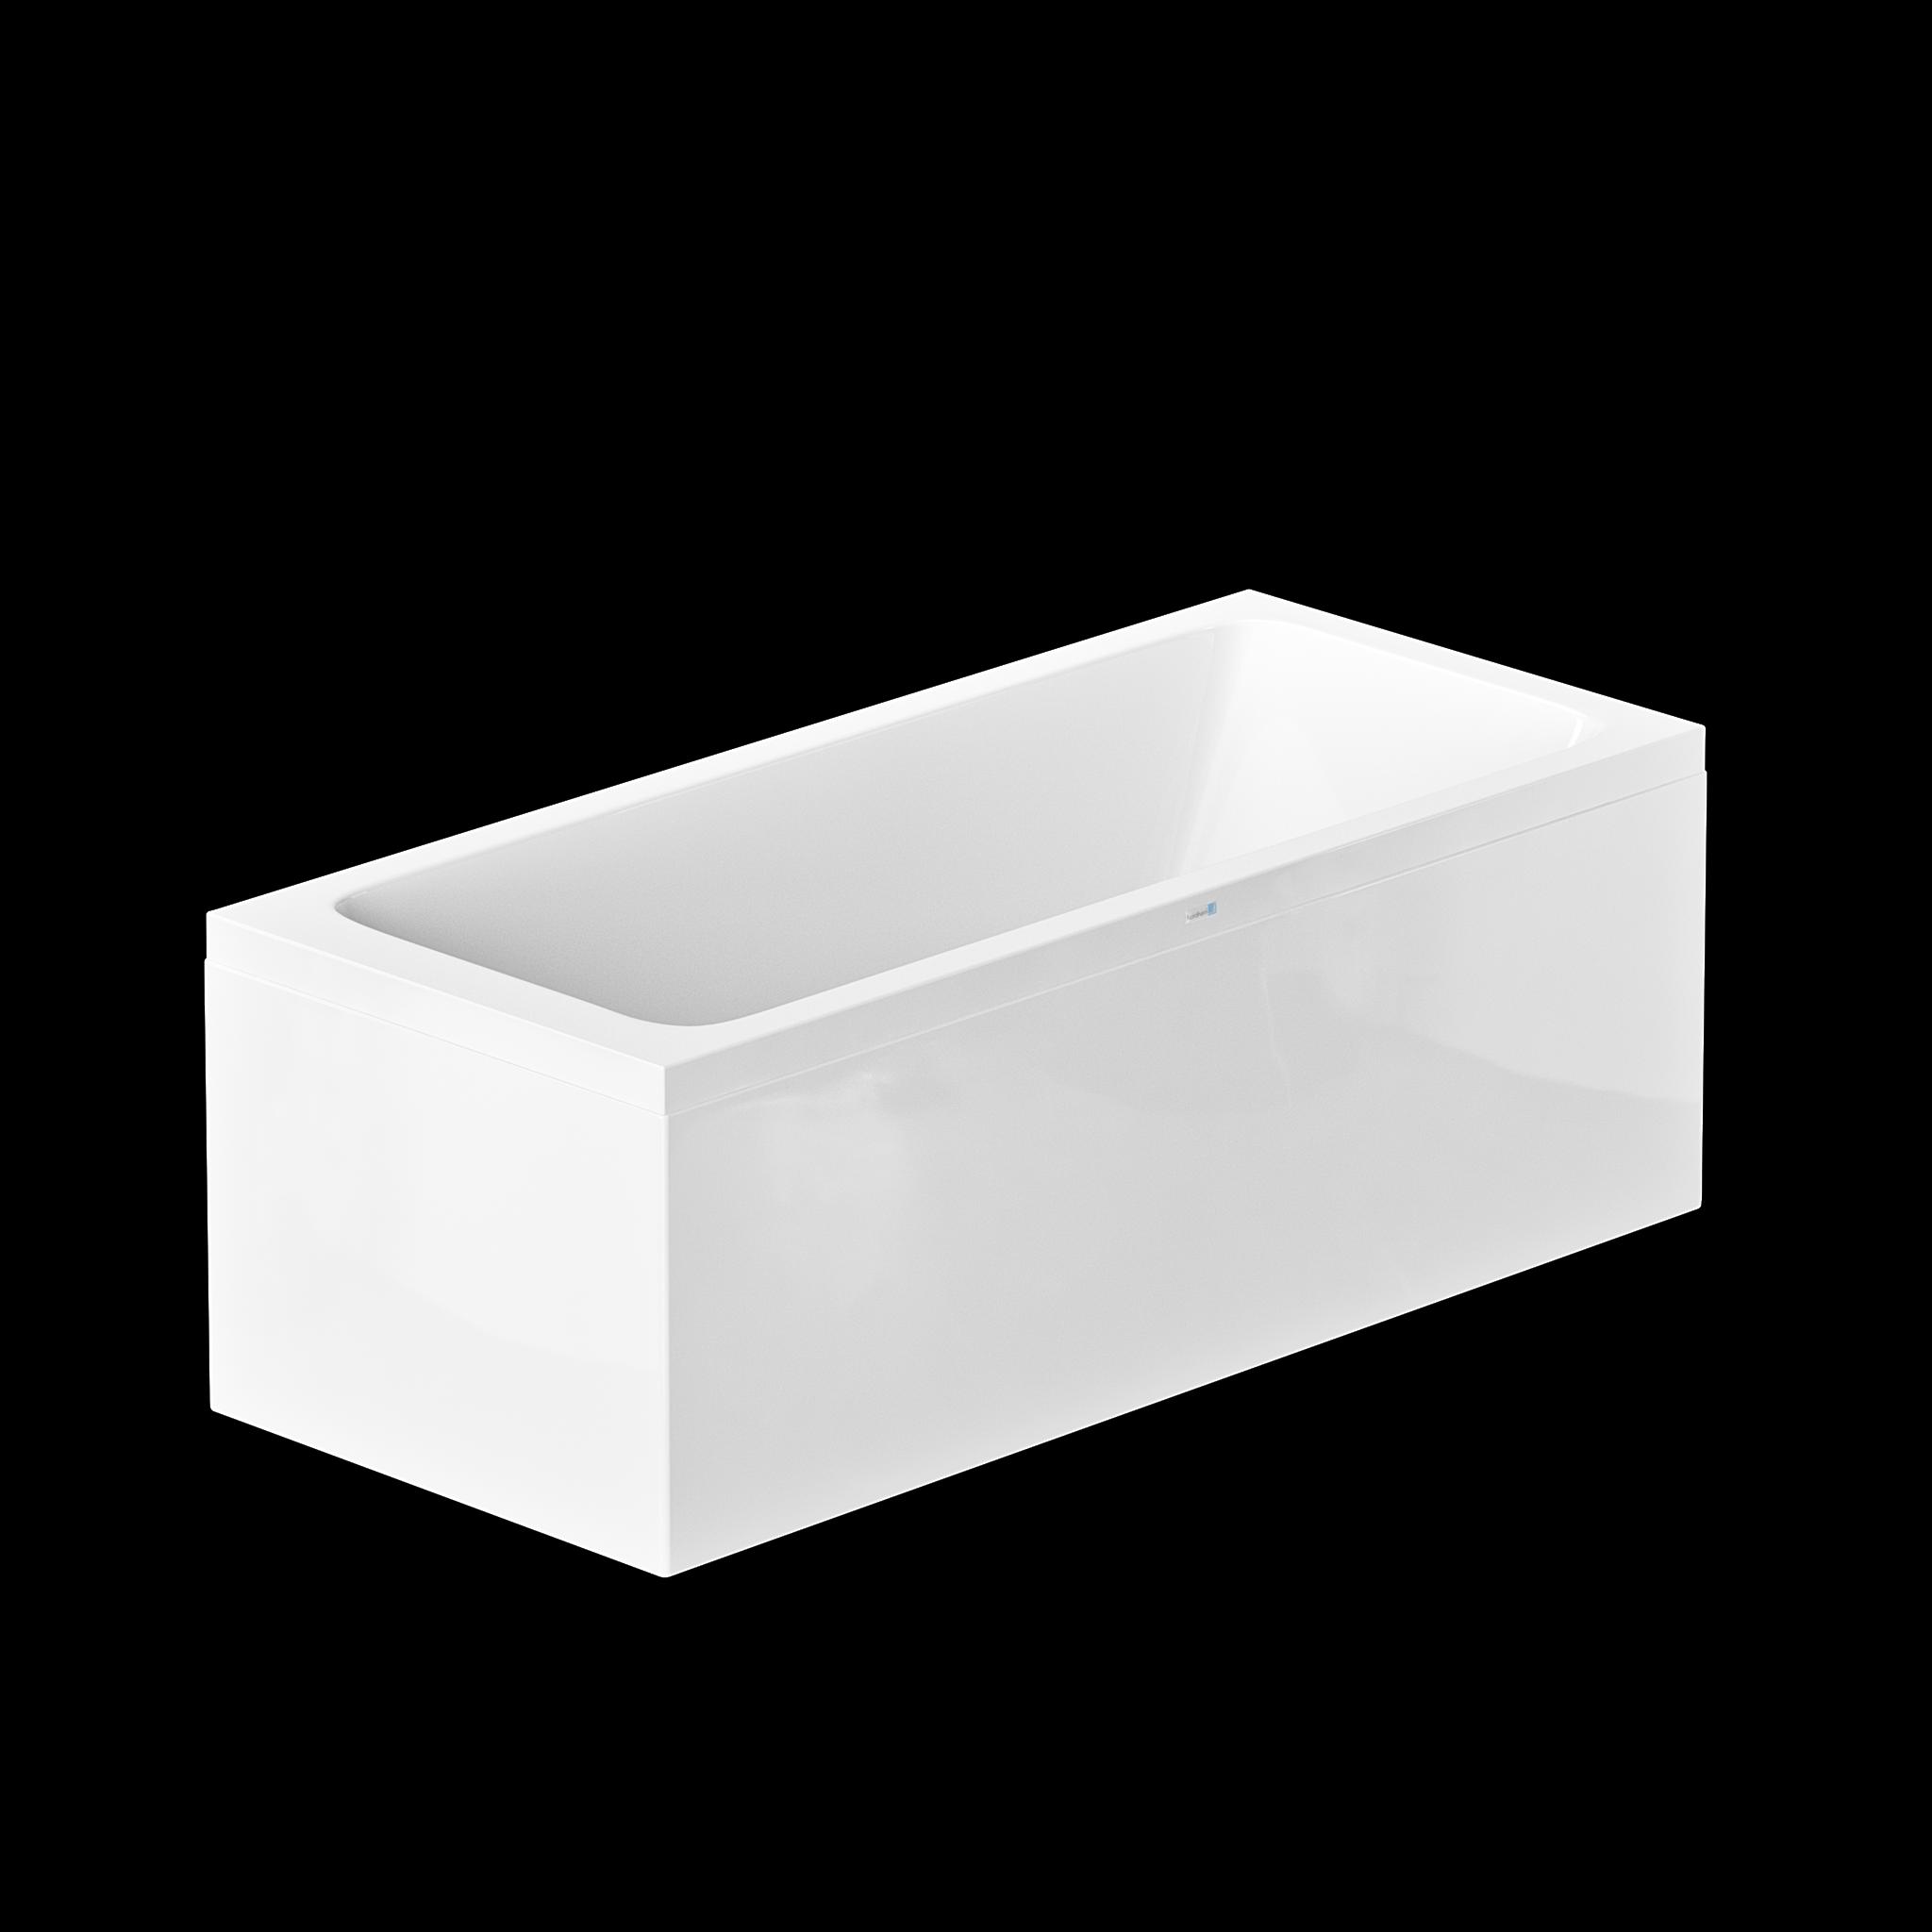 Nordhem badkar Saltholmen 1600x800x590 vit standard liksidig enkel